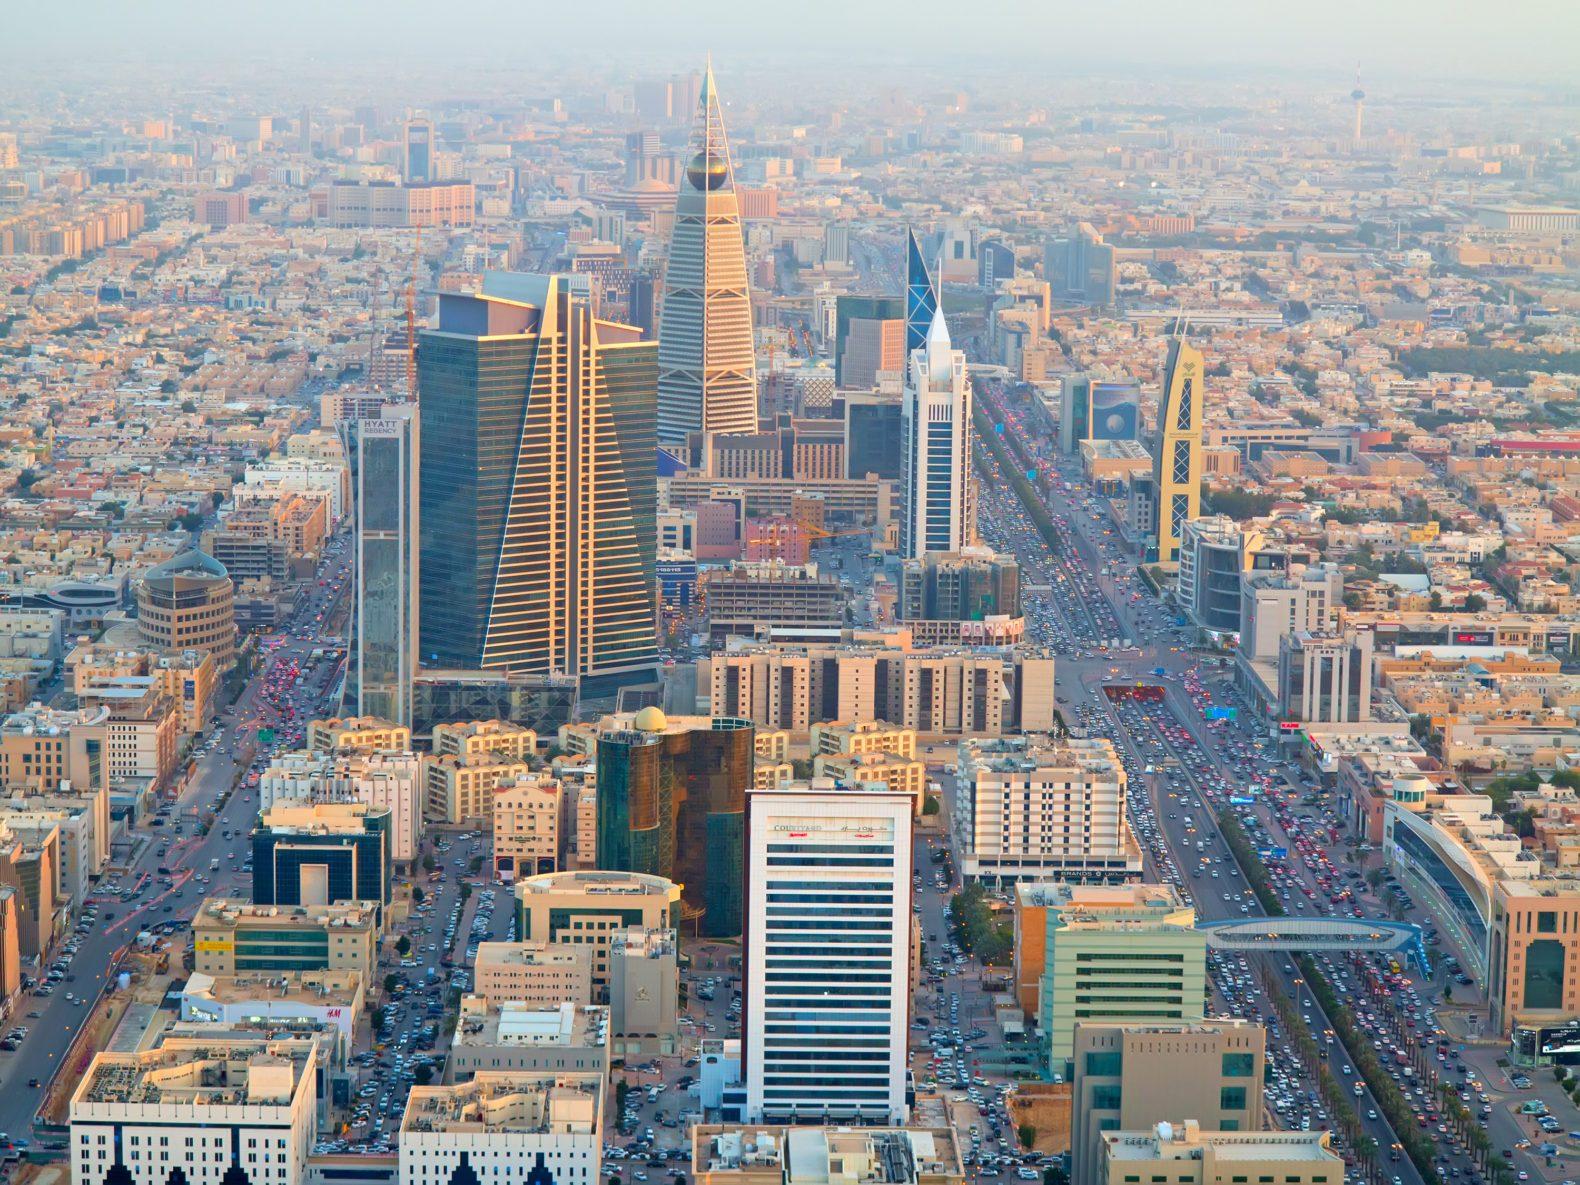 Saudi-Arabia-real-estate-1580x1185